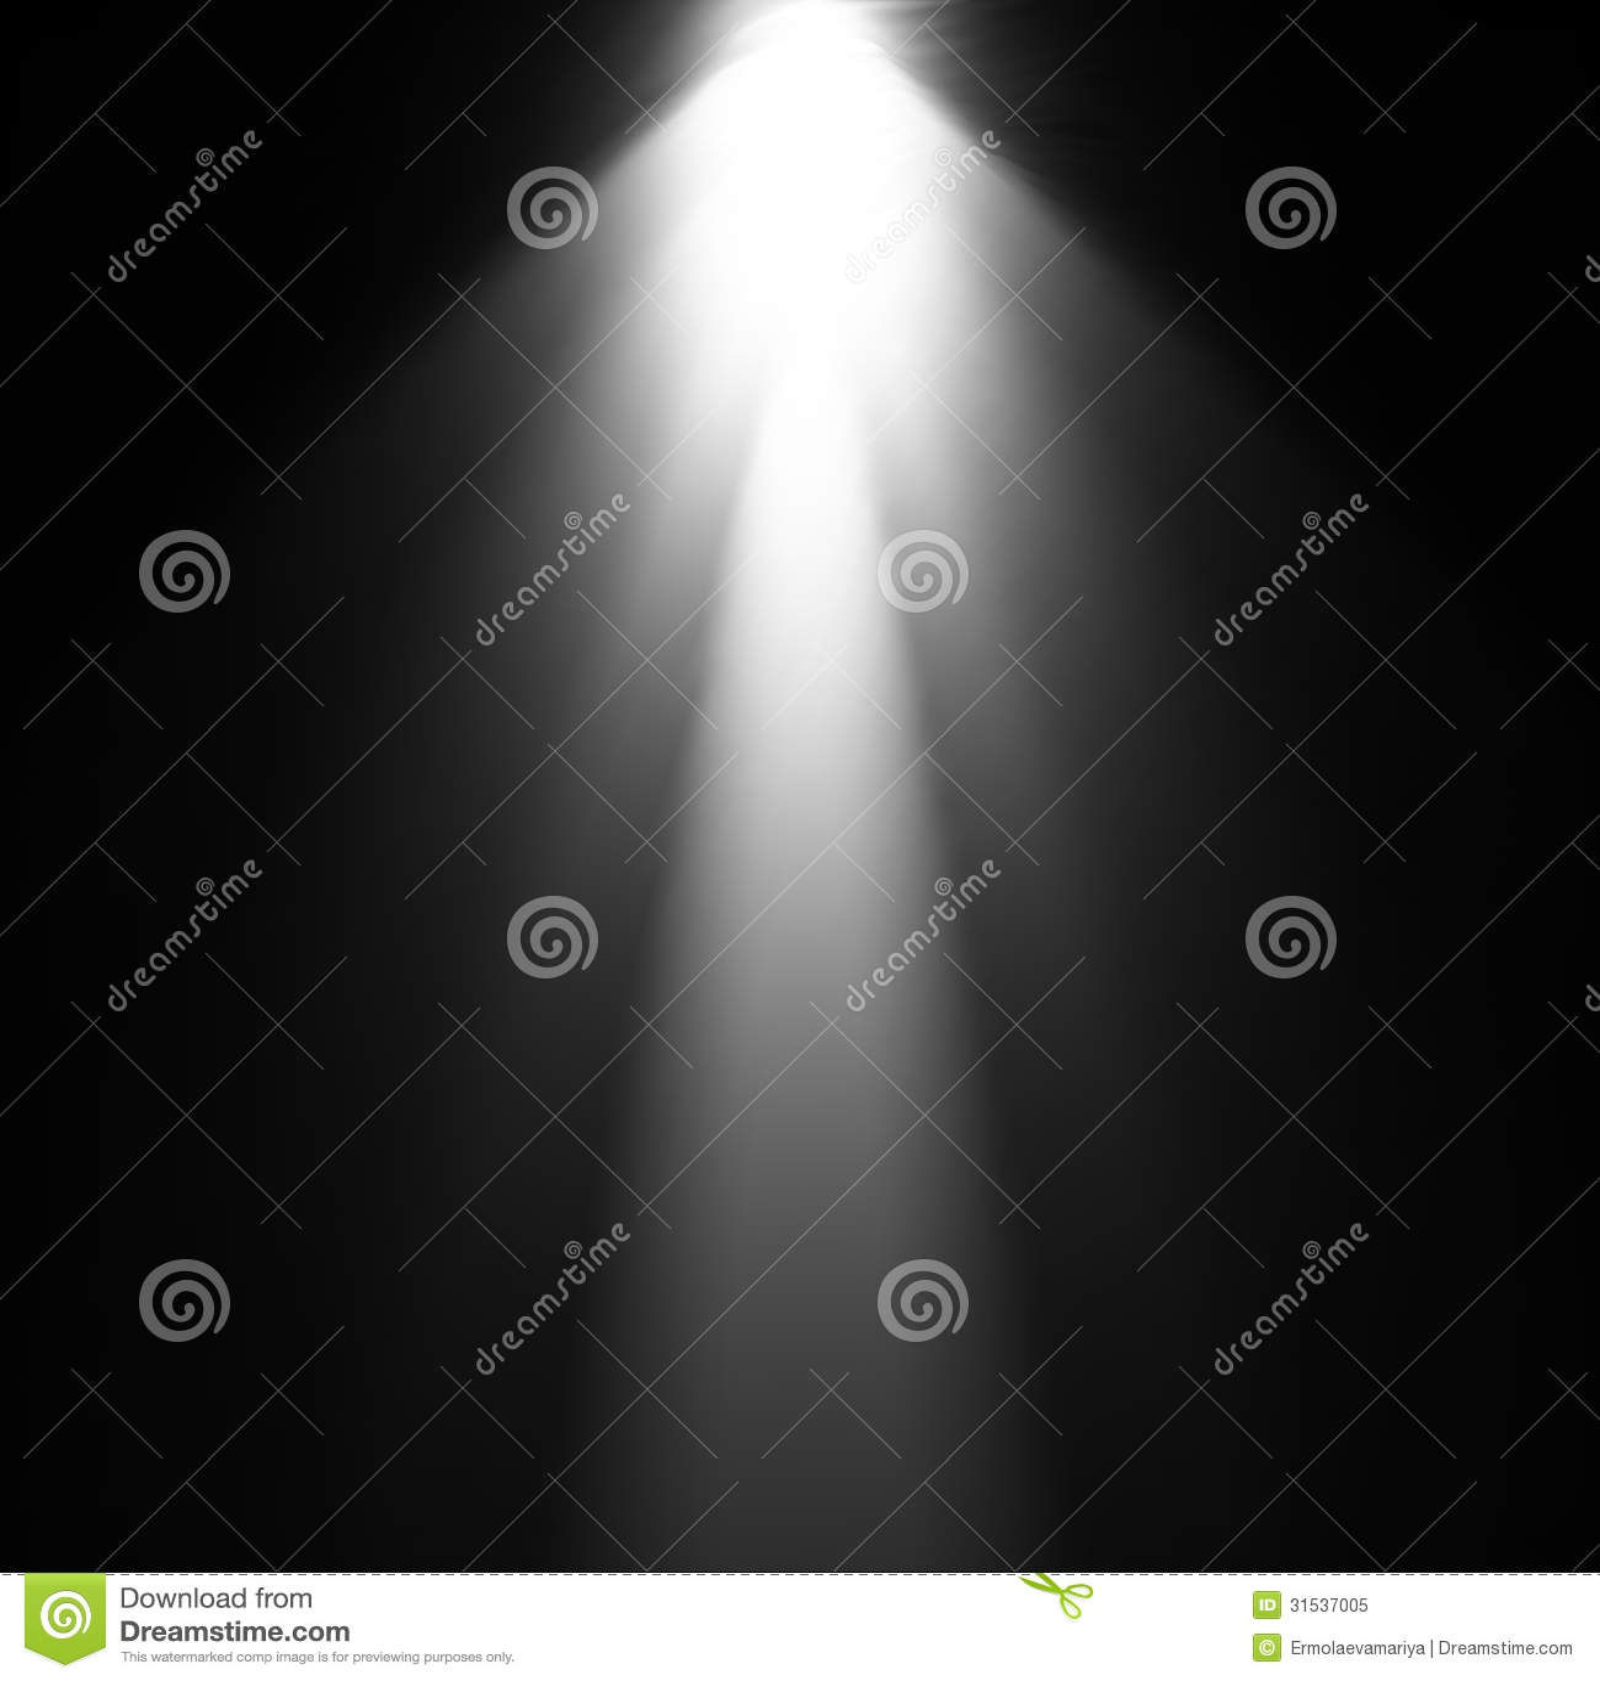 Light Beam From Projector. Vector Illustration Stock ...